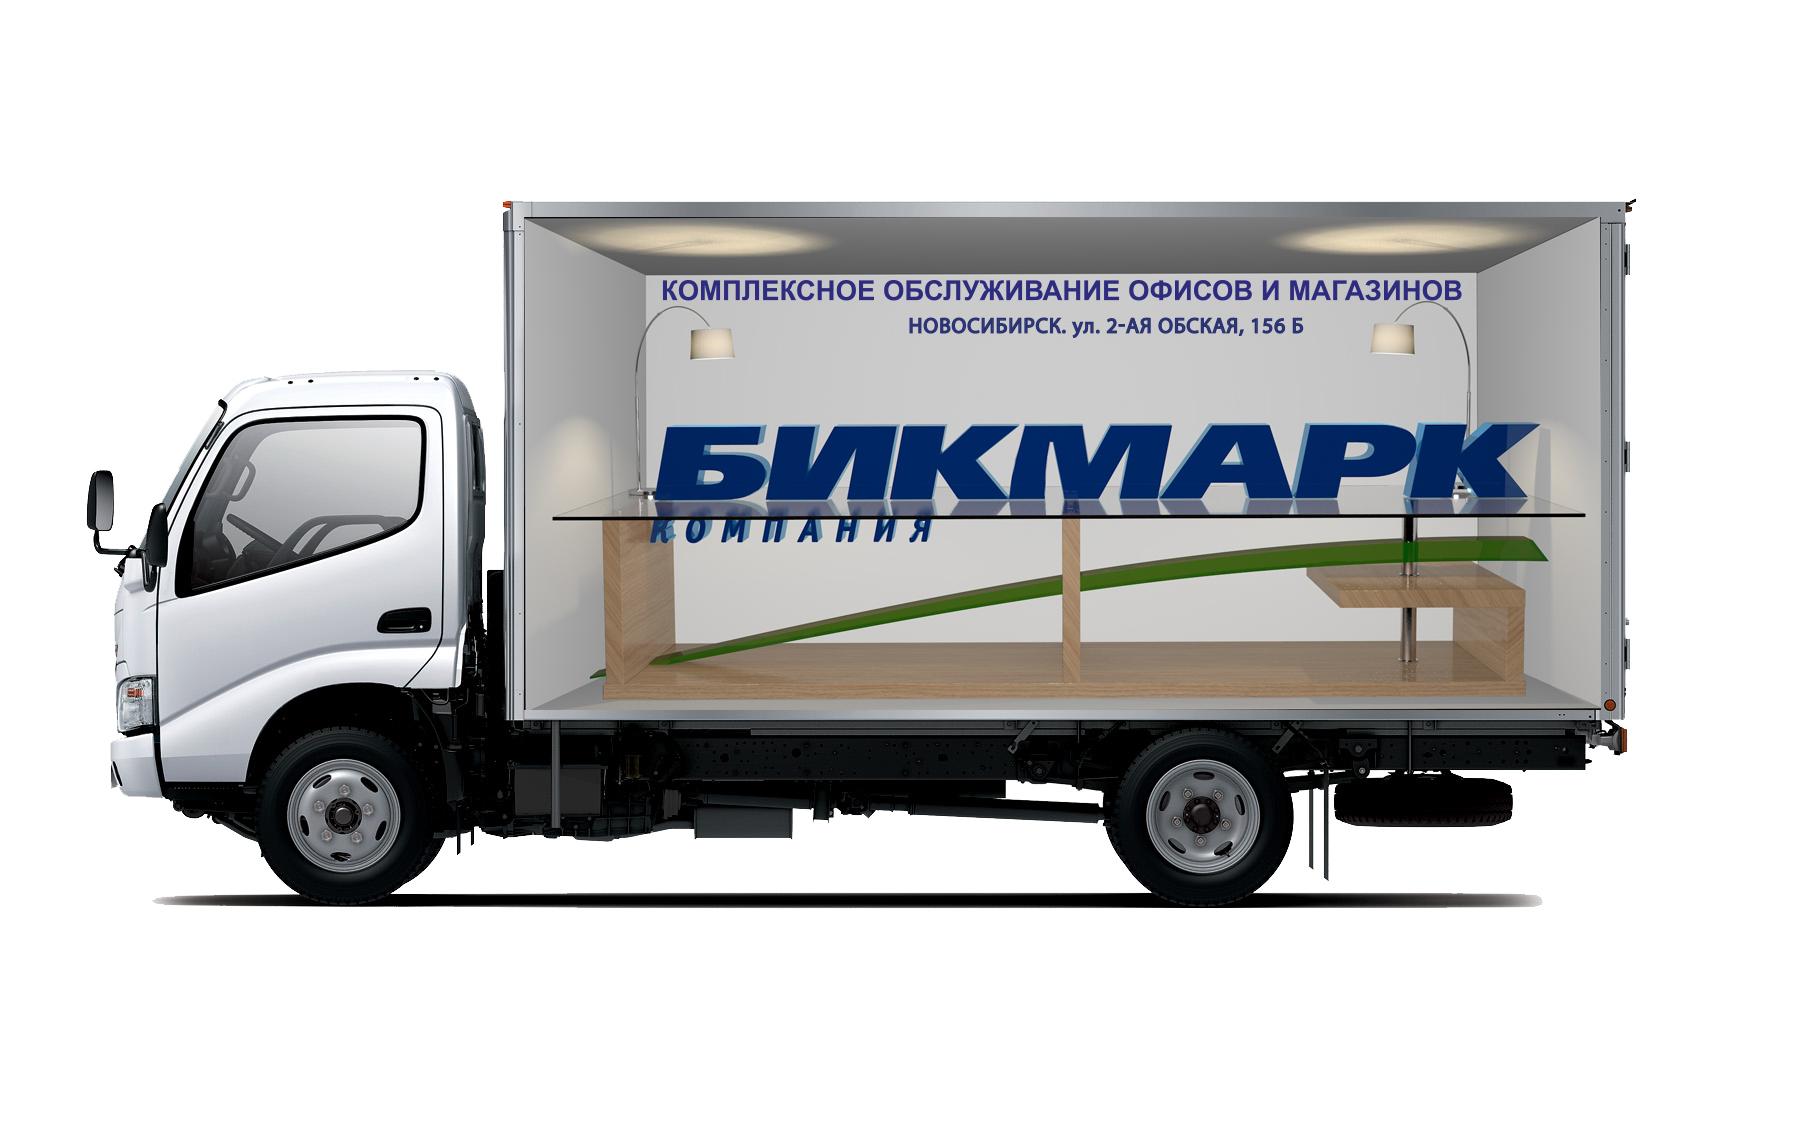 Разработка  рекламы на грузовые машины фото f_8655b2e9fcace207.jpg